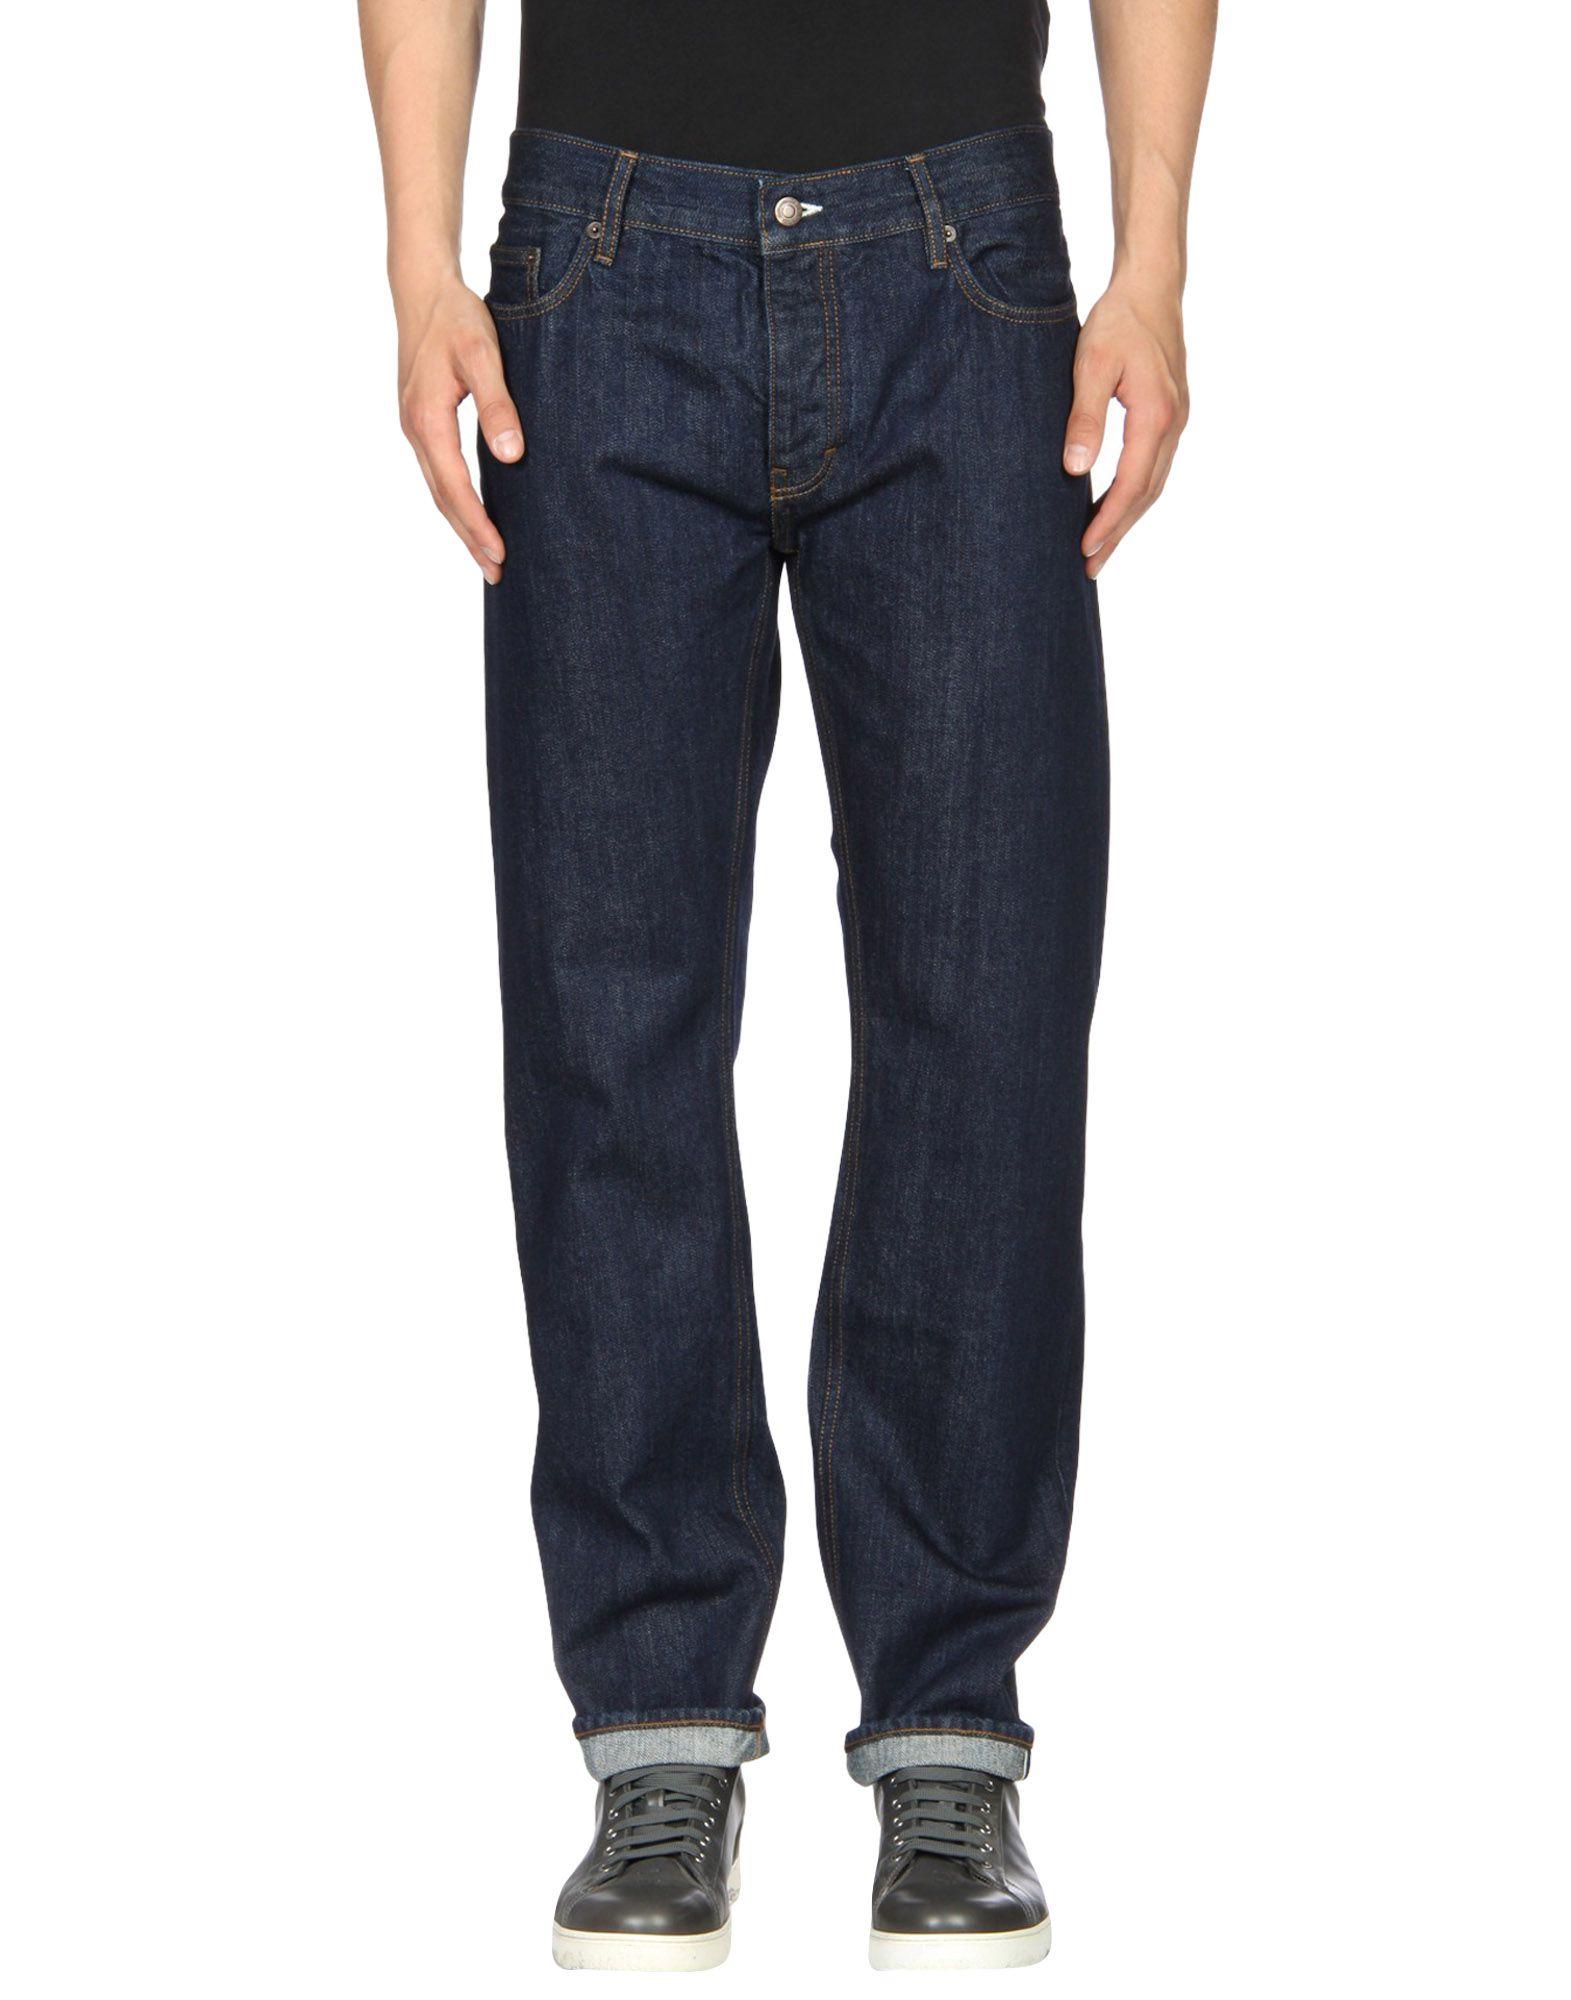 'Jean.machine Jean. Machine Jeans